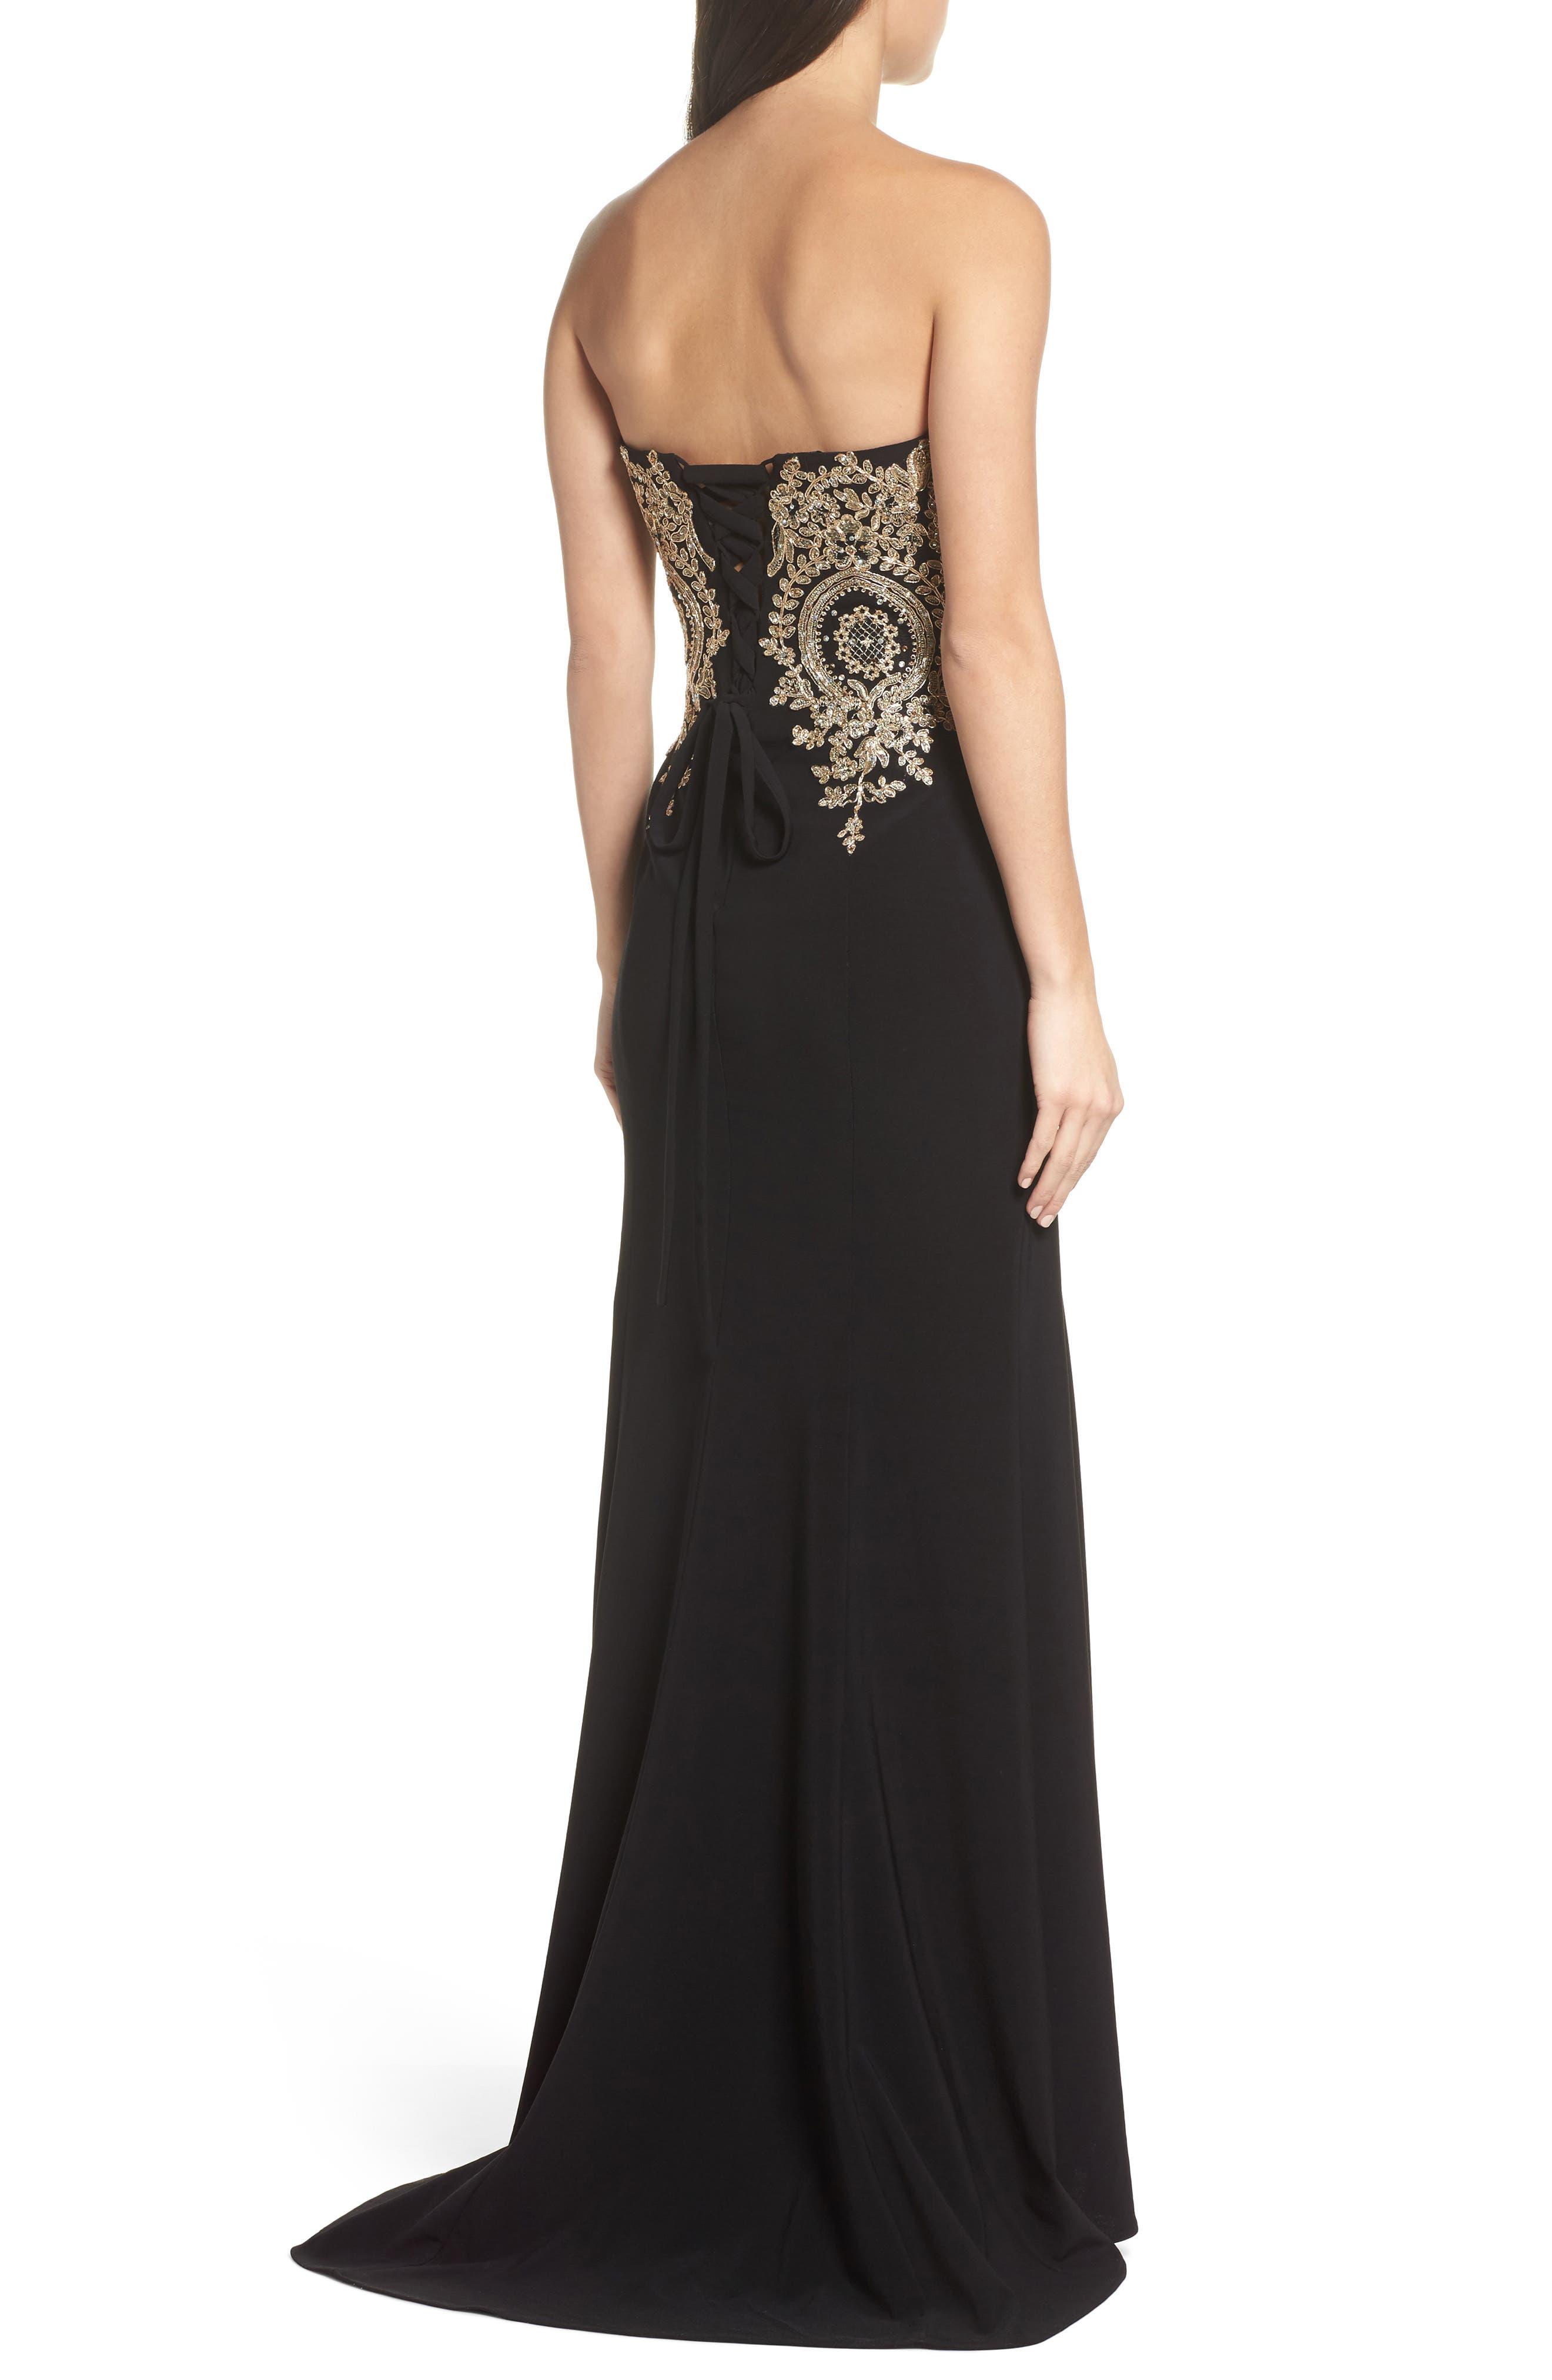 Corset Back Embellished Strapless Gown,                             Alternate thumbnail 2, color,                             Black/ Gold